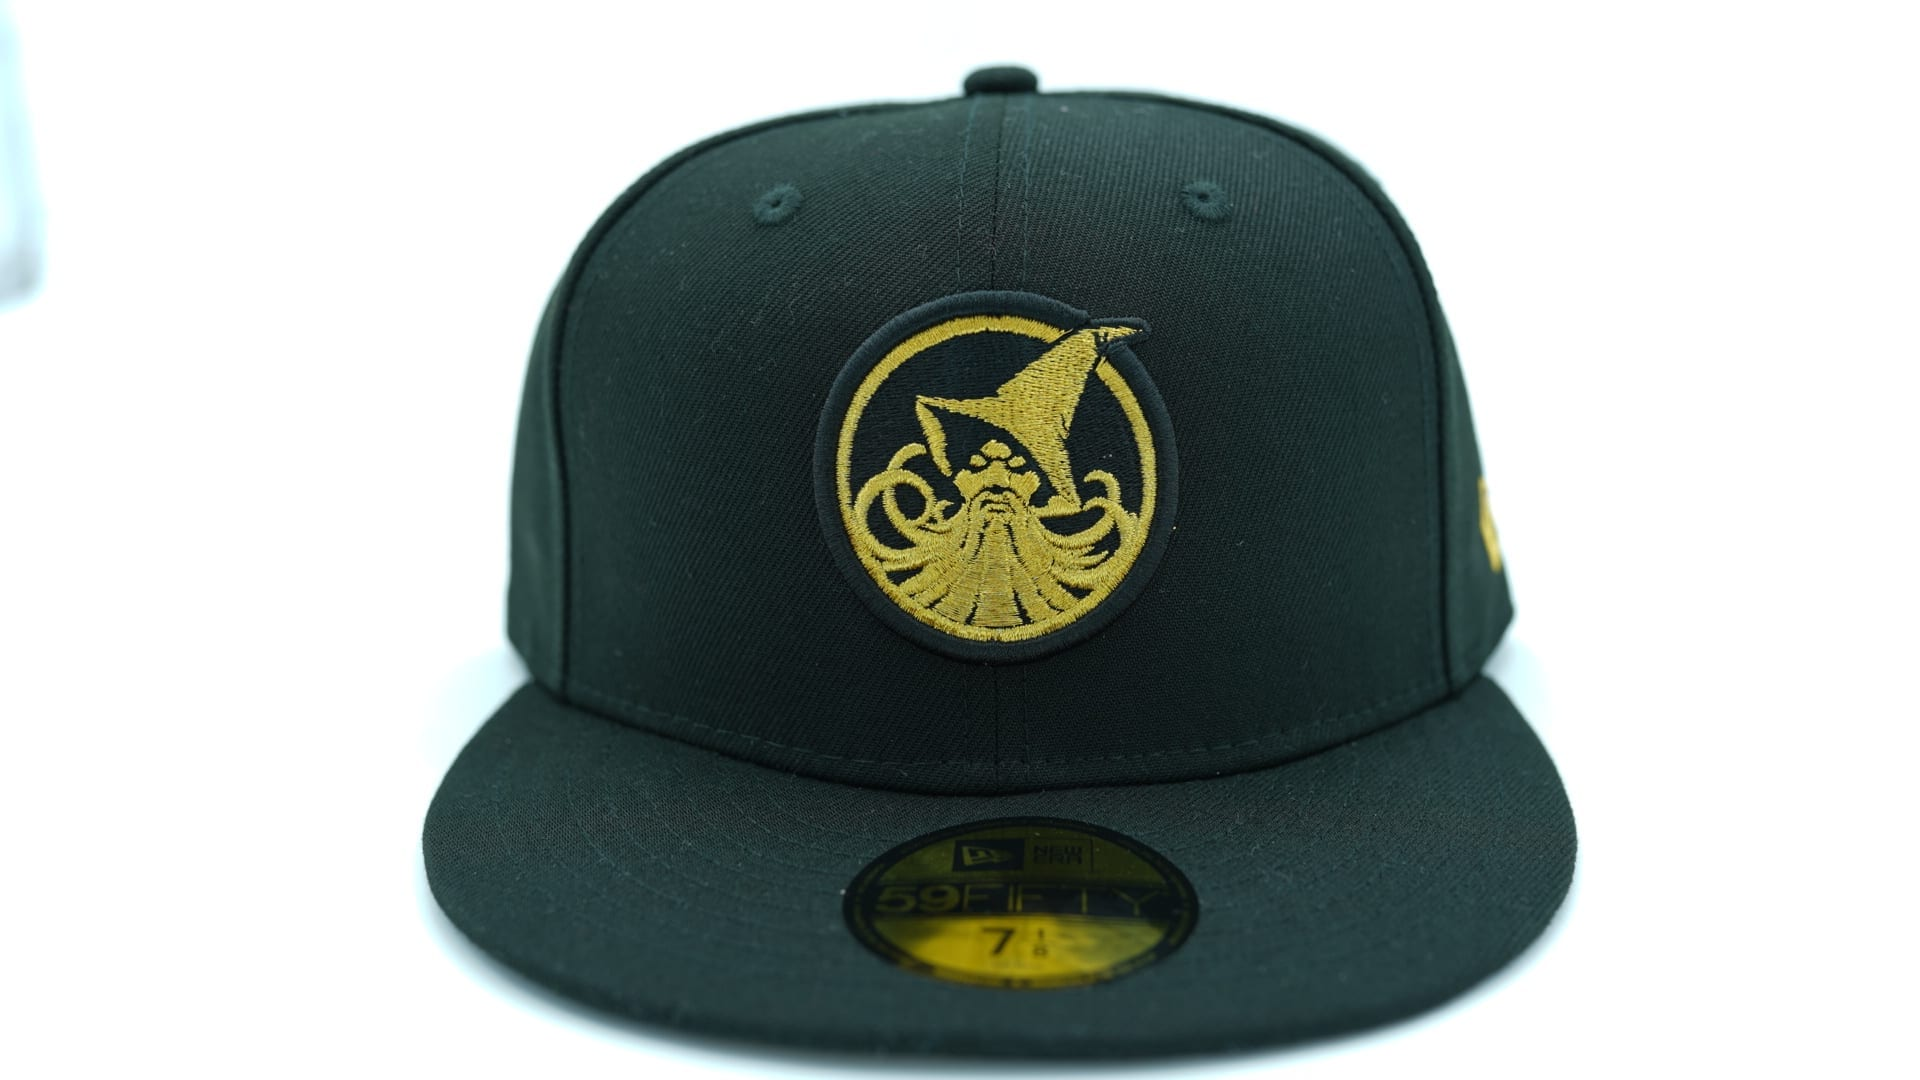 new york yankees mini logo scarlet 59fifty fitted baseball cap new era mlb 1